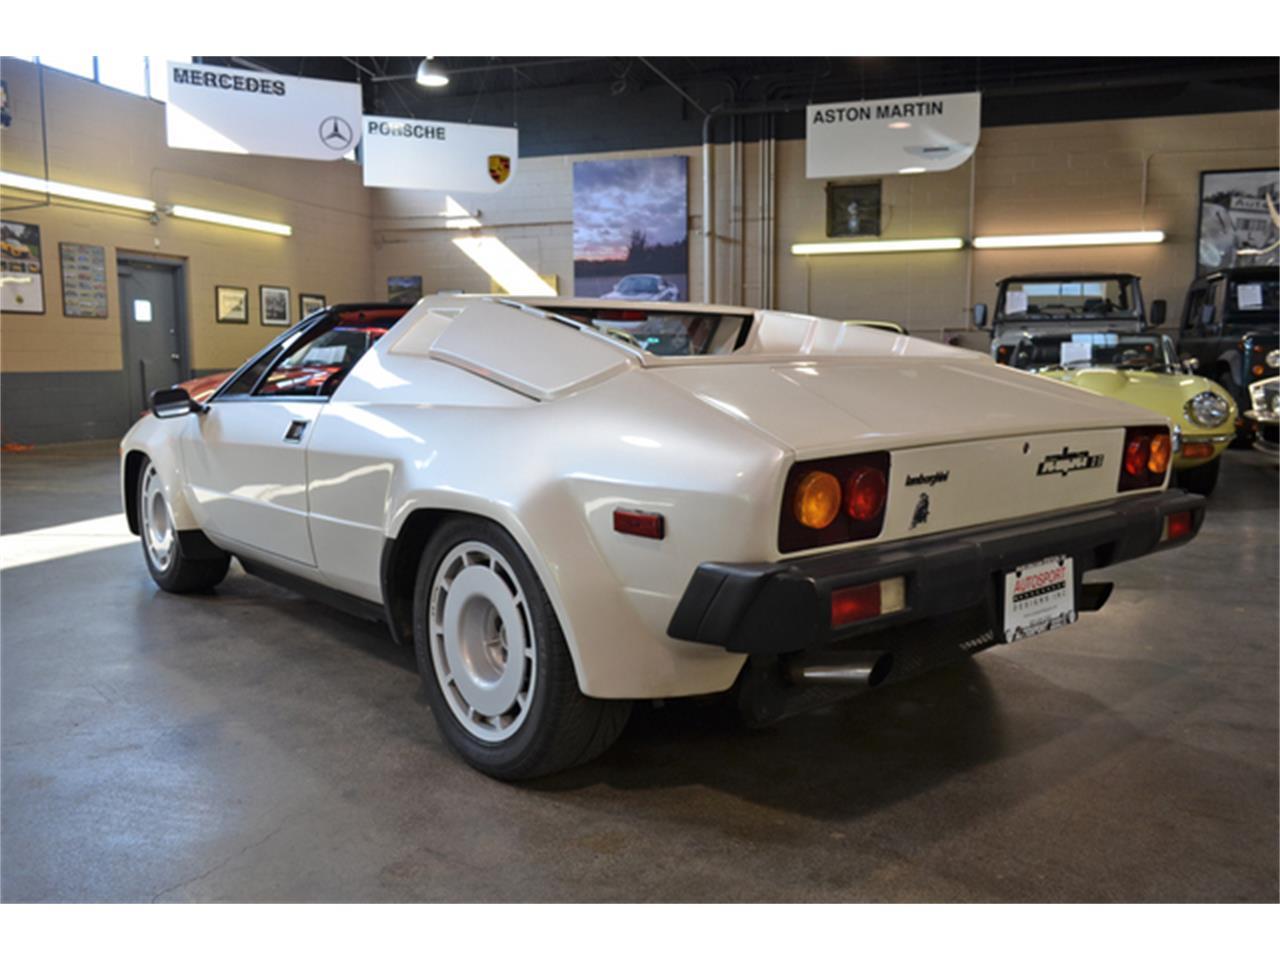 Large Picture of '87 Lamborghini Jalpa located in Huntington Station New York Auction Vehicle - M6IZ